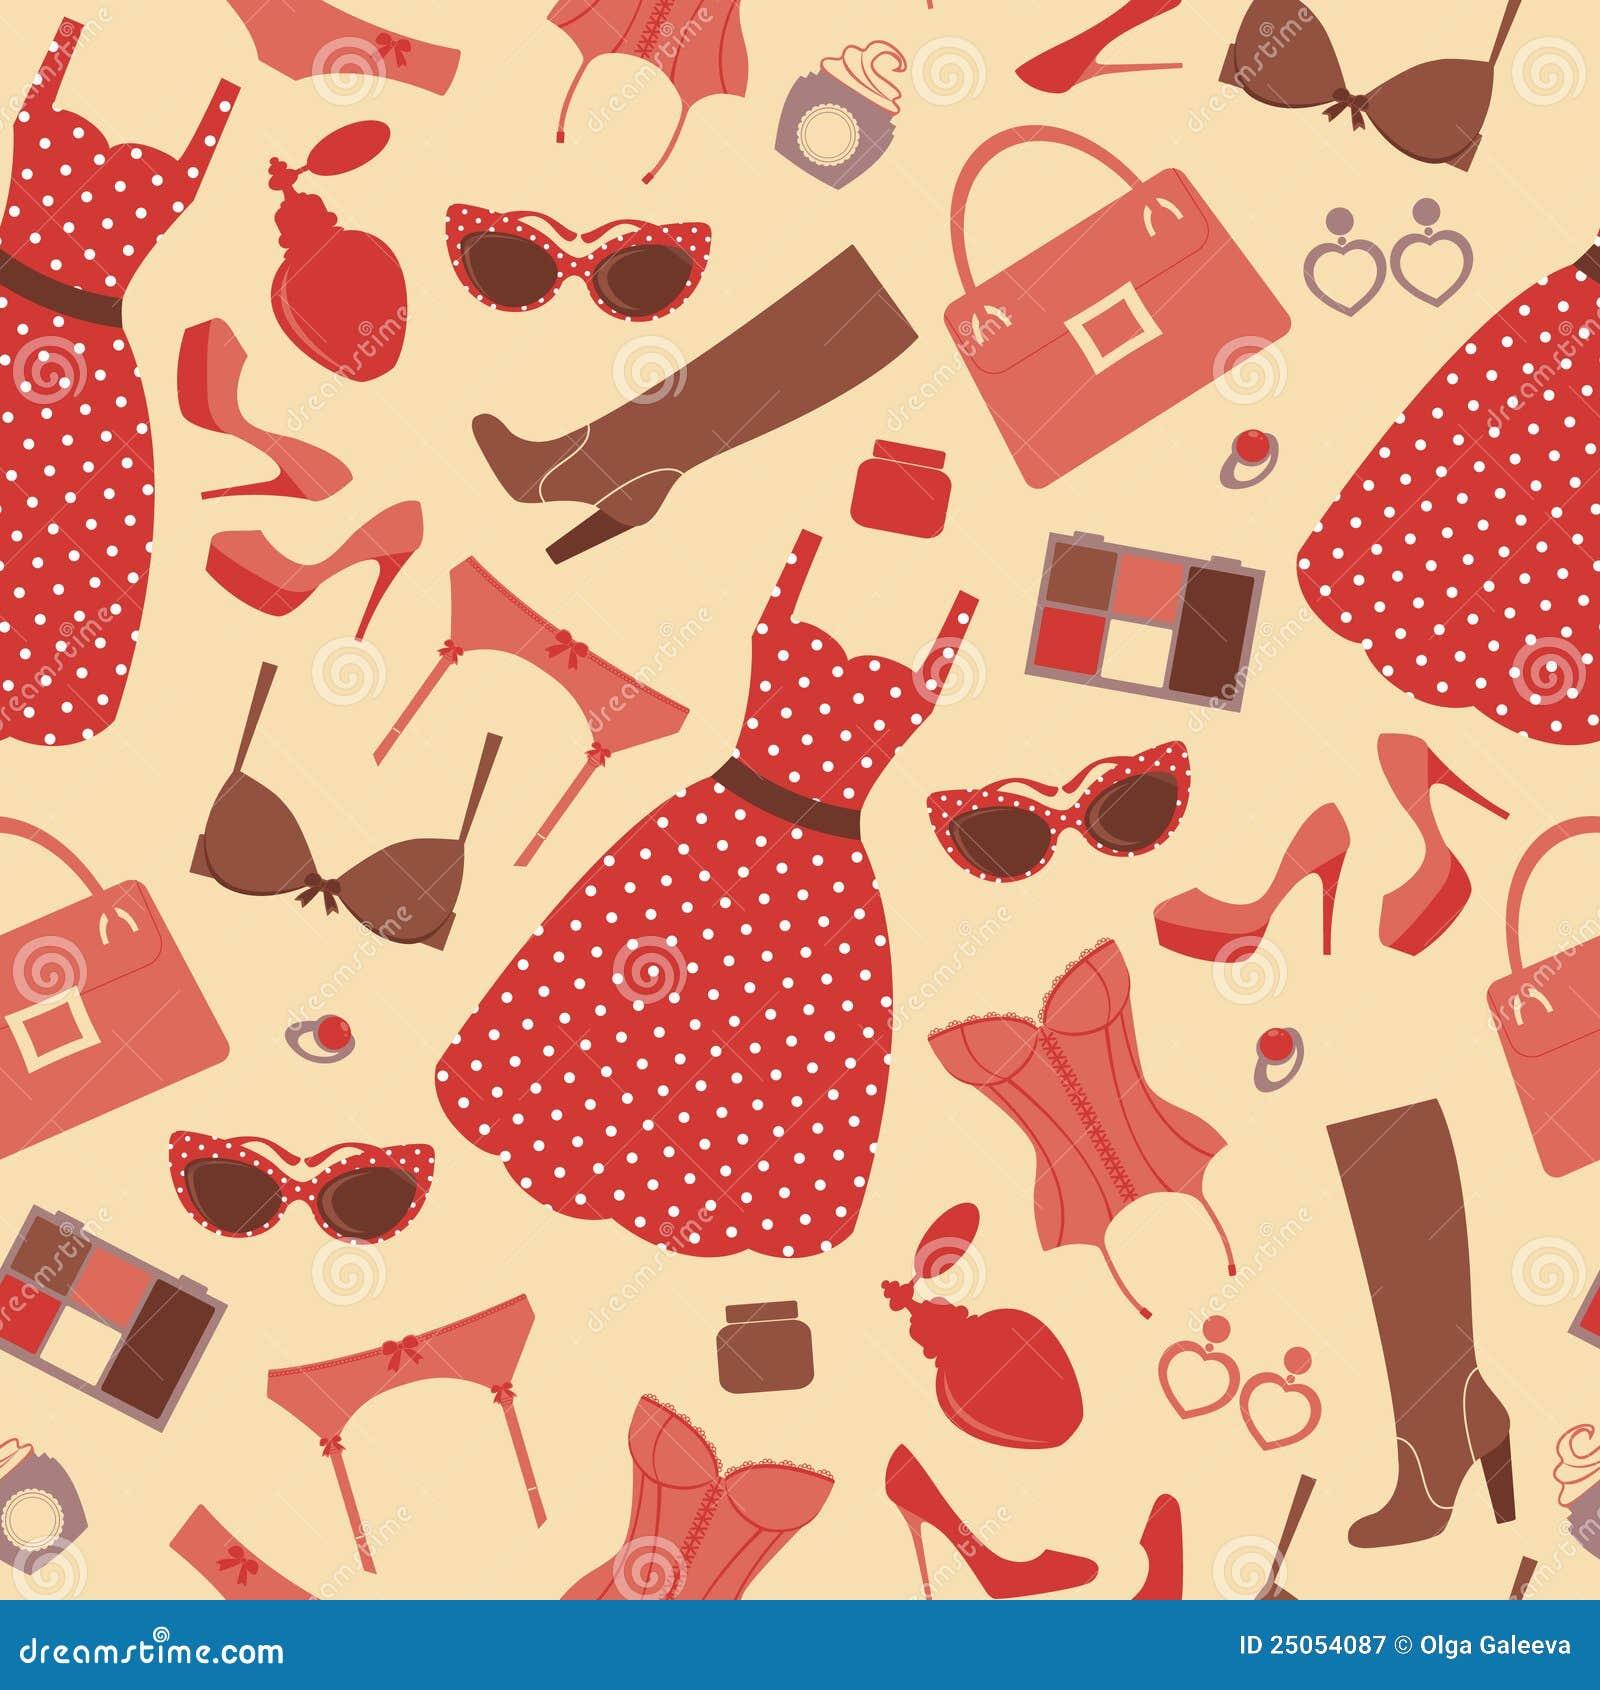 Fashion pattern stock vector. Illustration of heels, girl ...